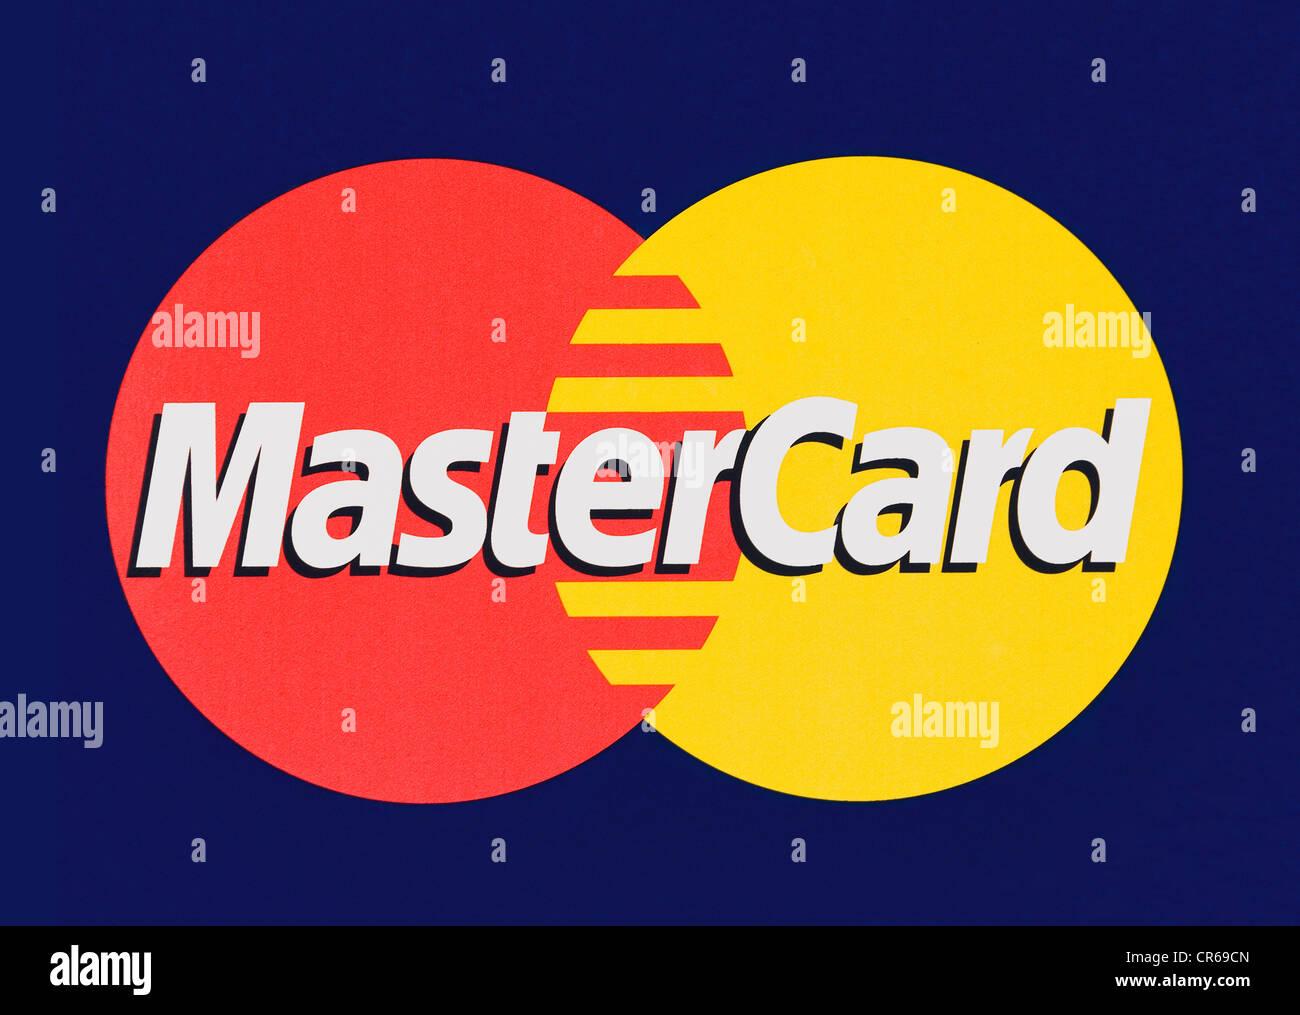 MasterCard logo, MasterCard International, credit card organization - Stock Image